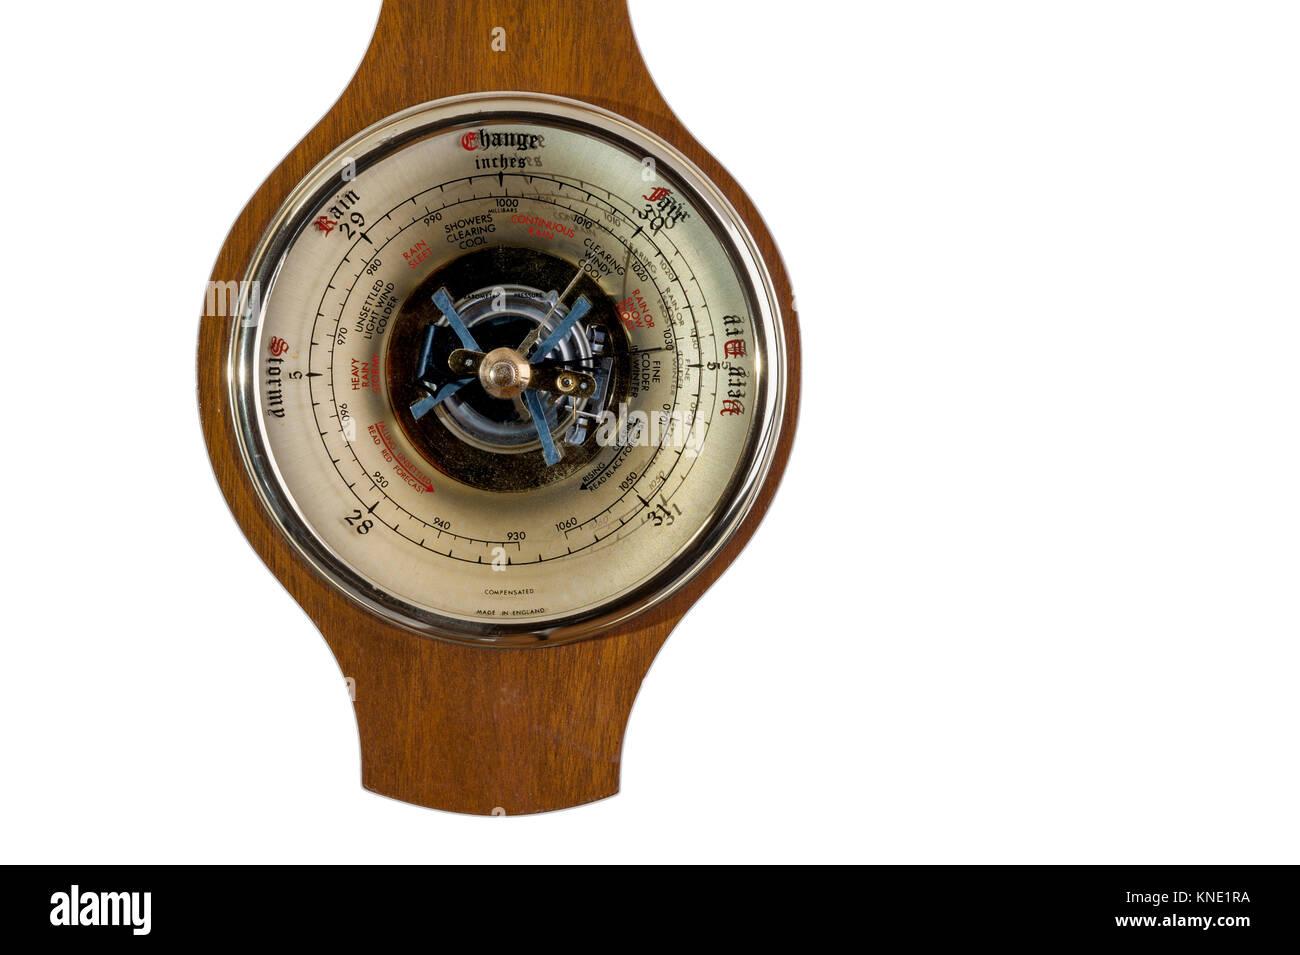 Barometer Stock Photos Amp Barometer Stock Images Alamy